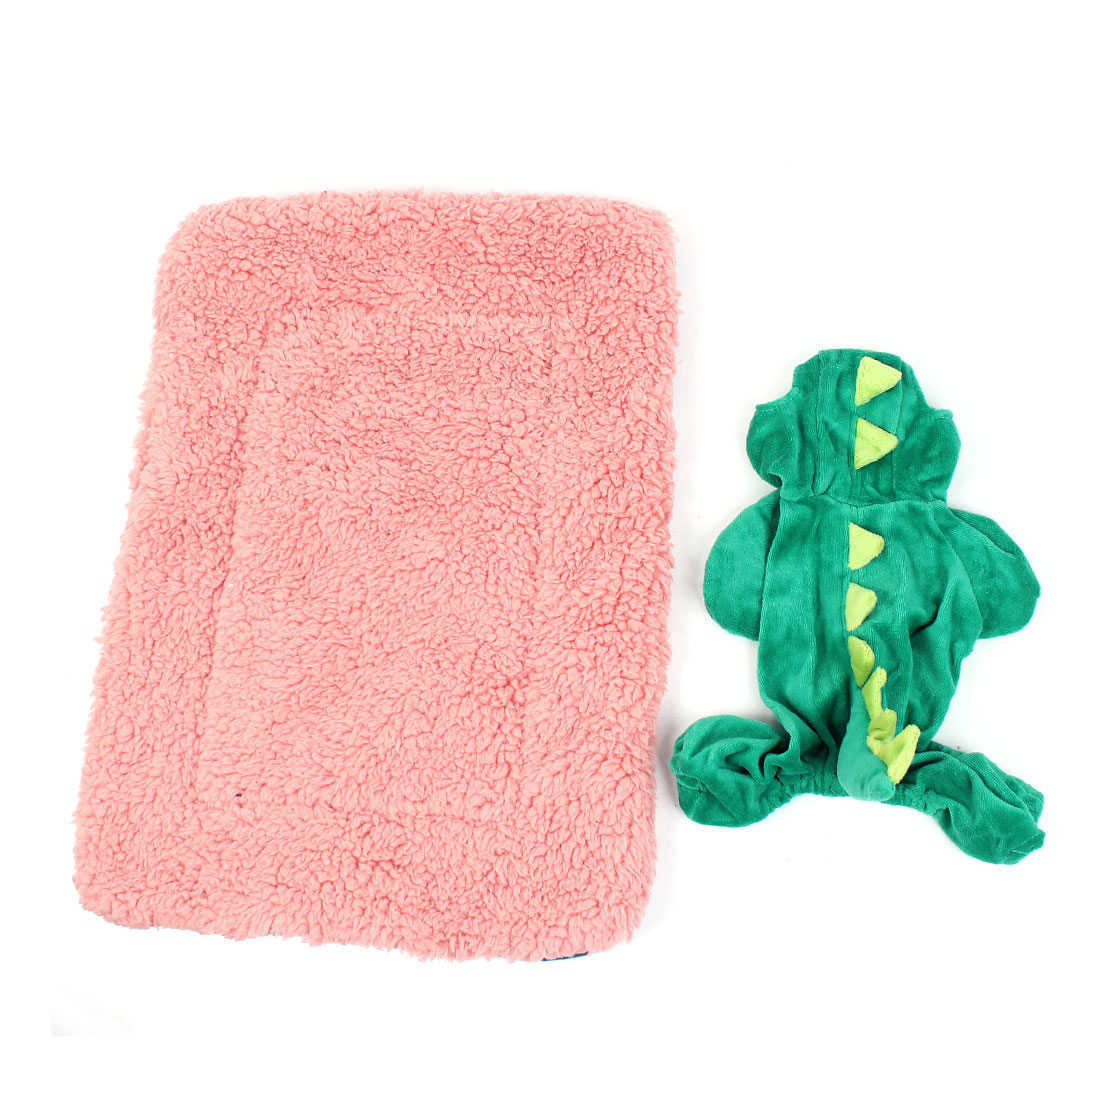 Winter Warm 2 in 1 Pet Dog Cushion Pad Mat w Dinosaur Shape Coat Apparel XXS